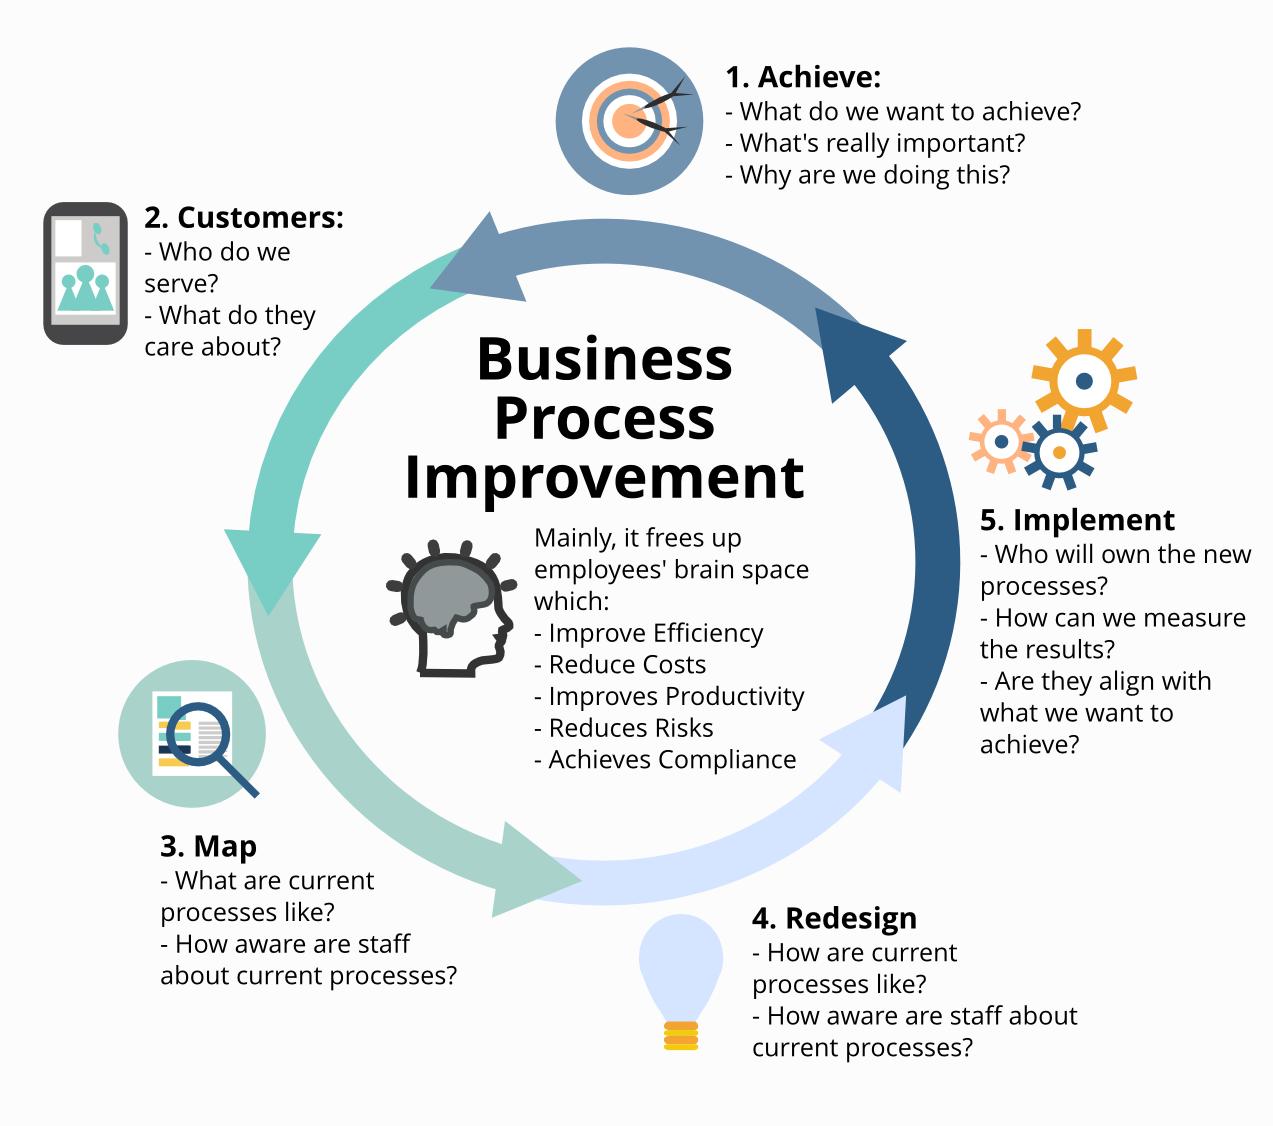 Process Improvement: Business Process Improvement